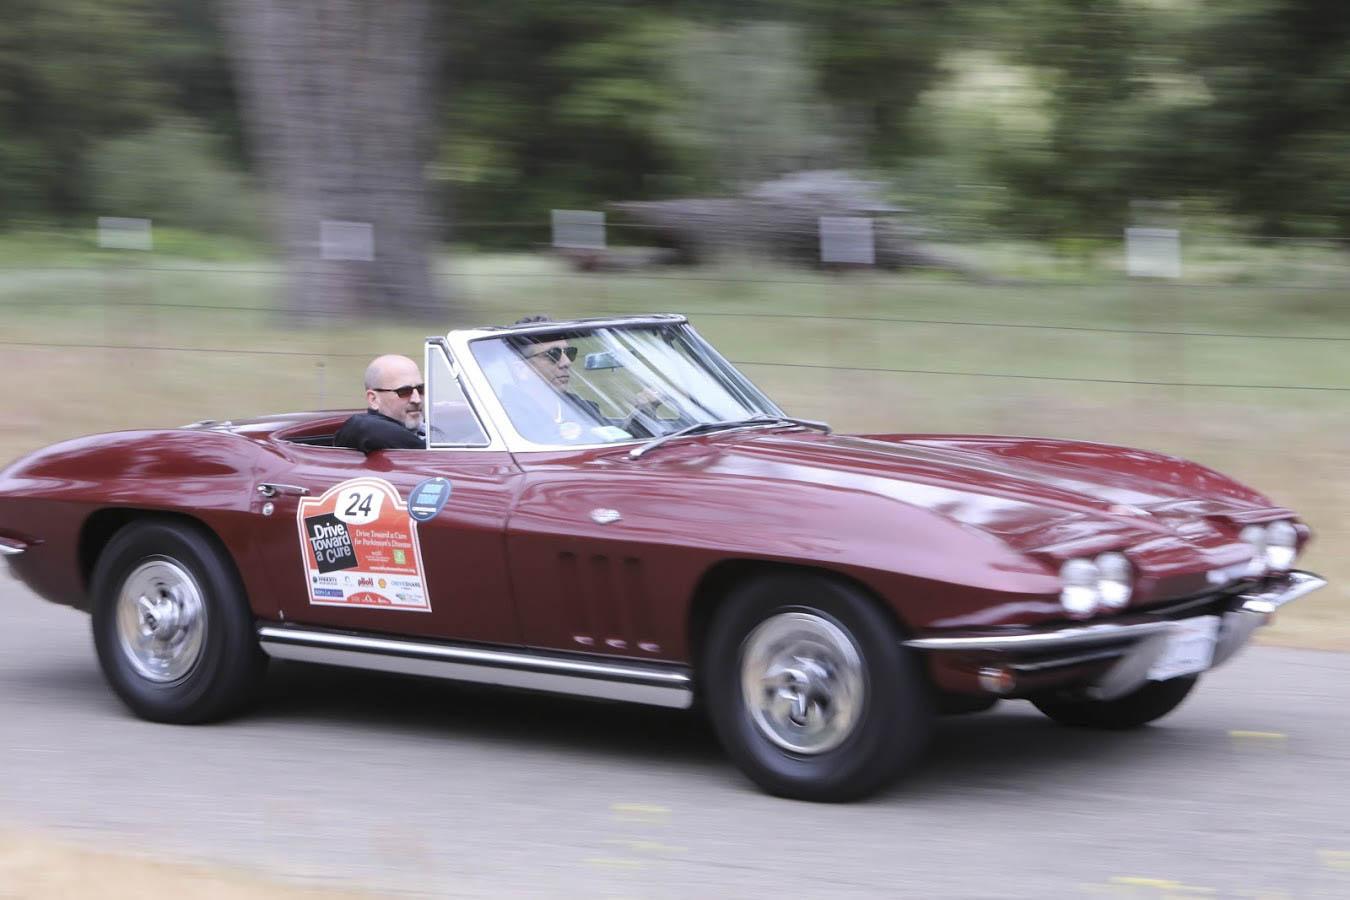 1965 Chevrolet Corvette front 3/4 driving